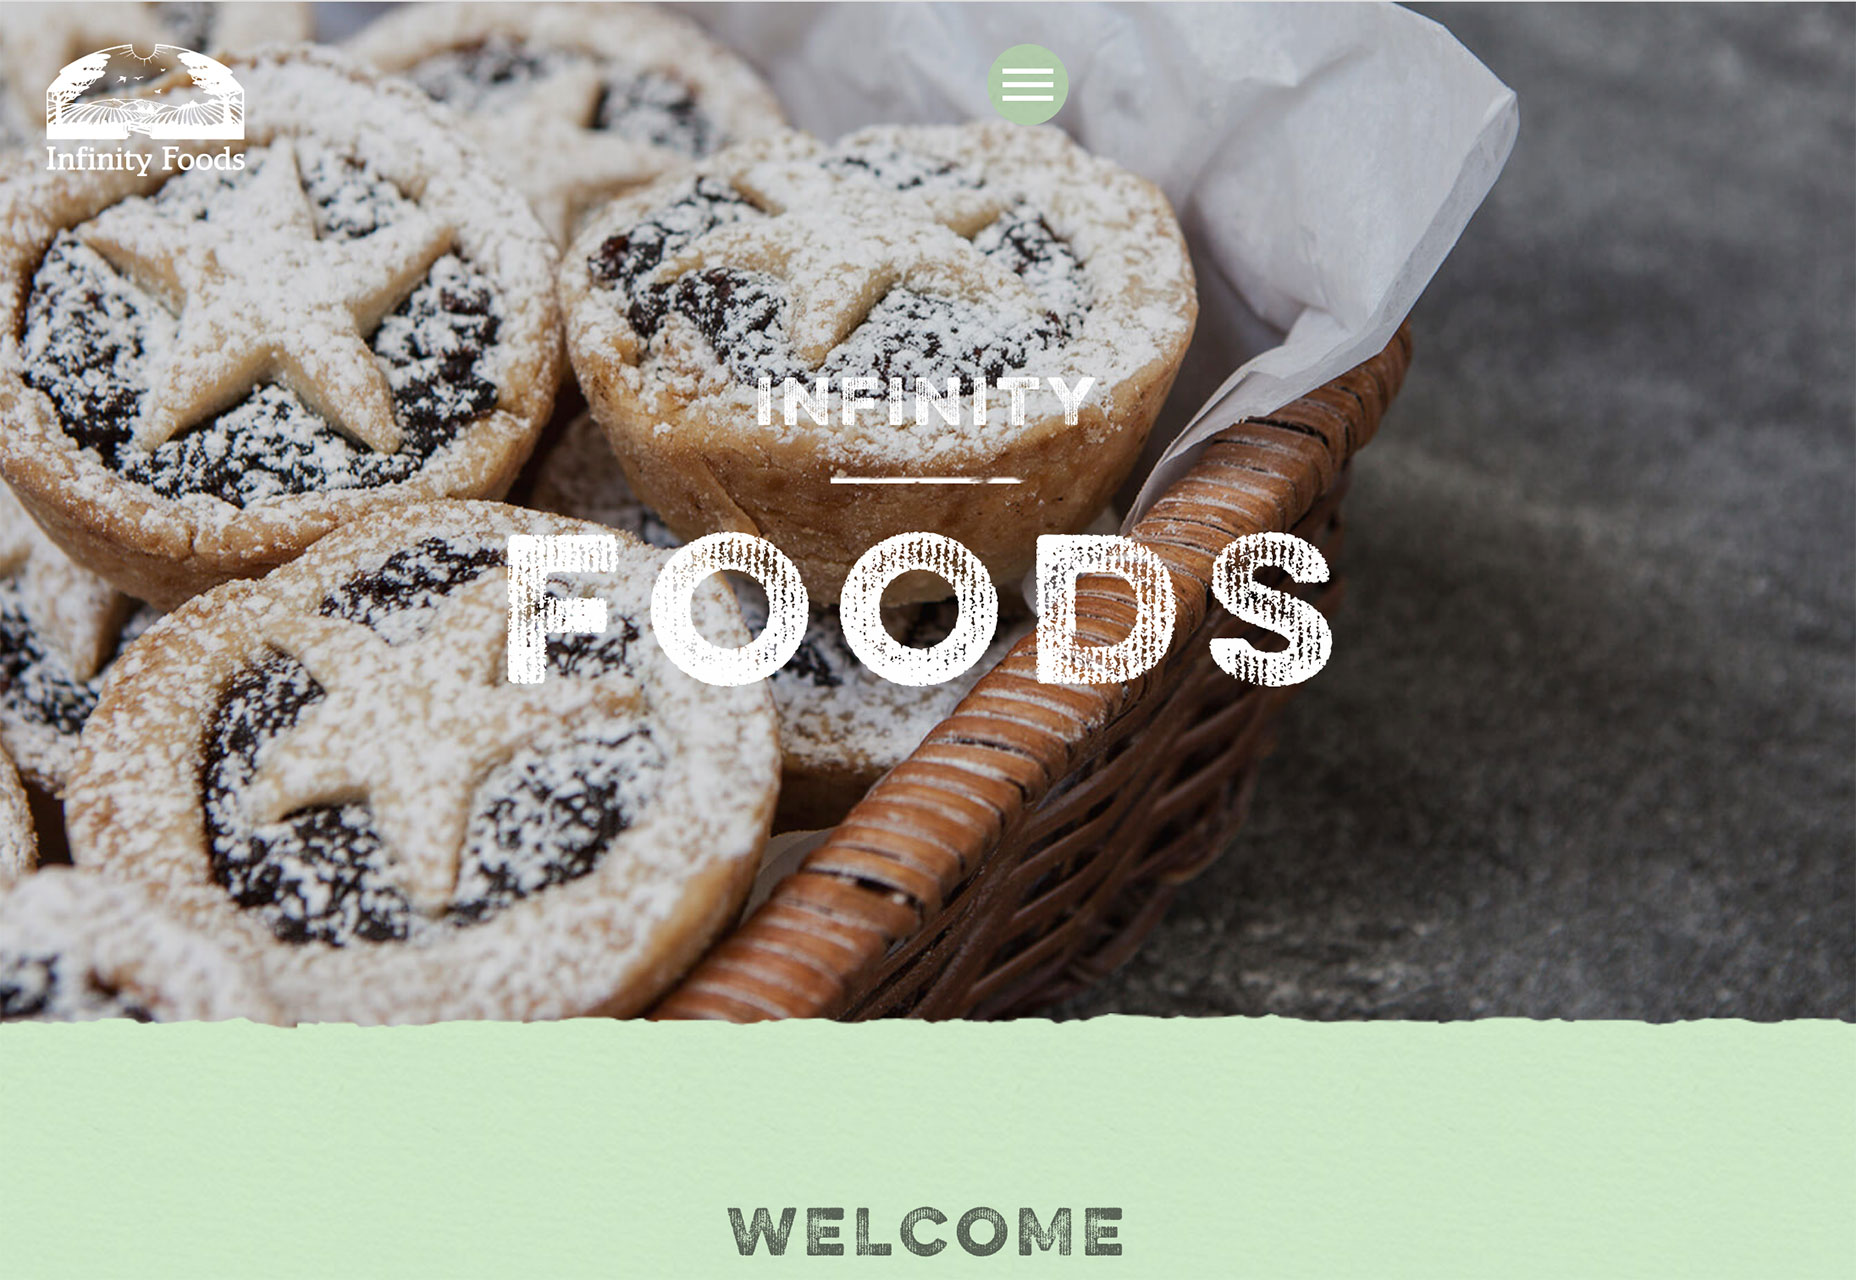 infinity-foods